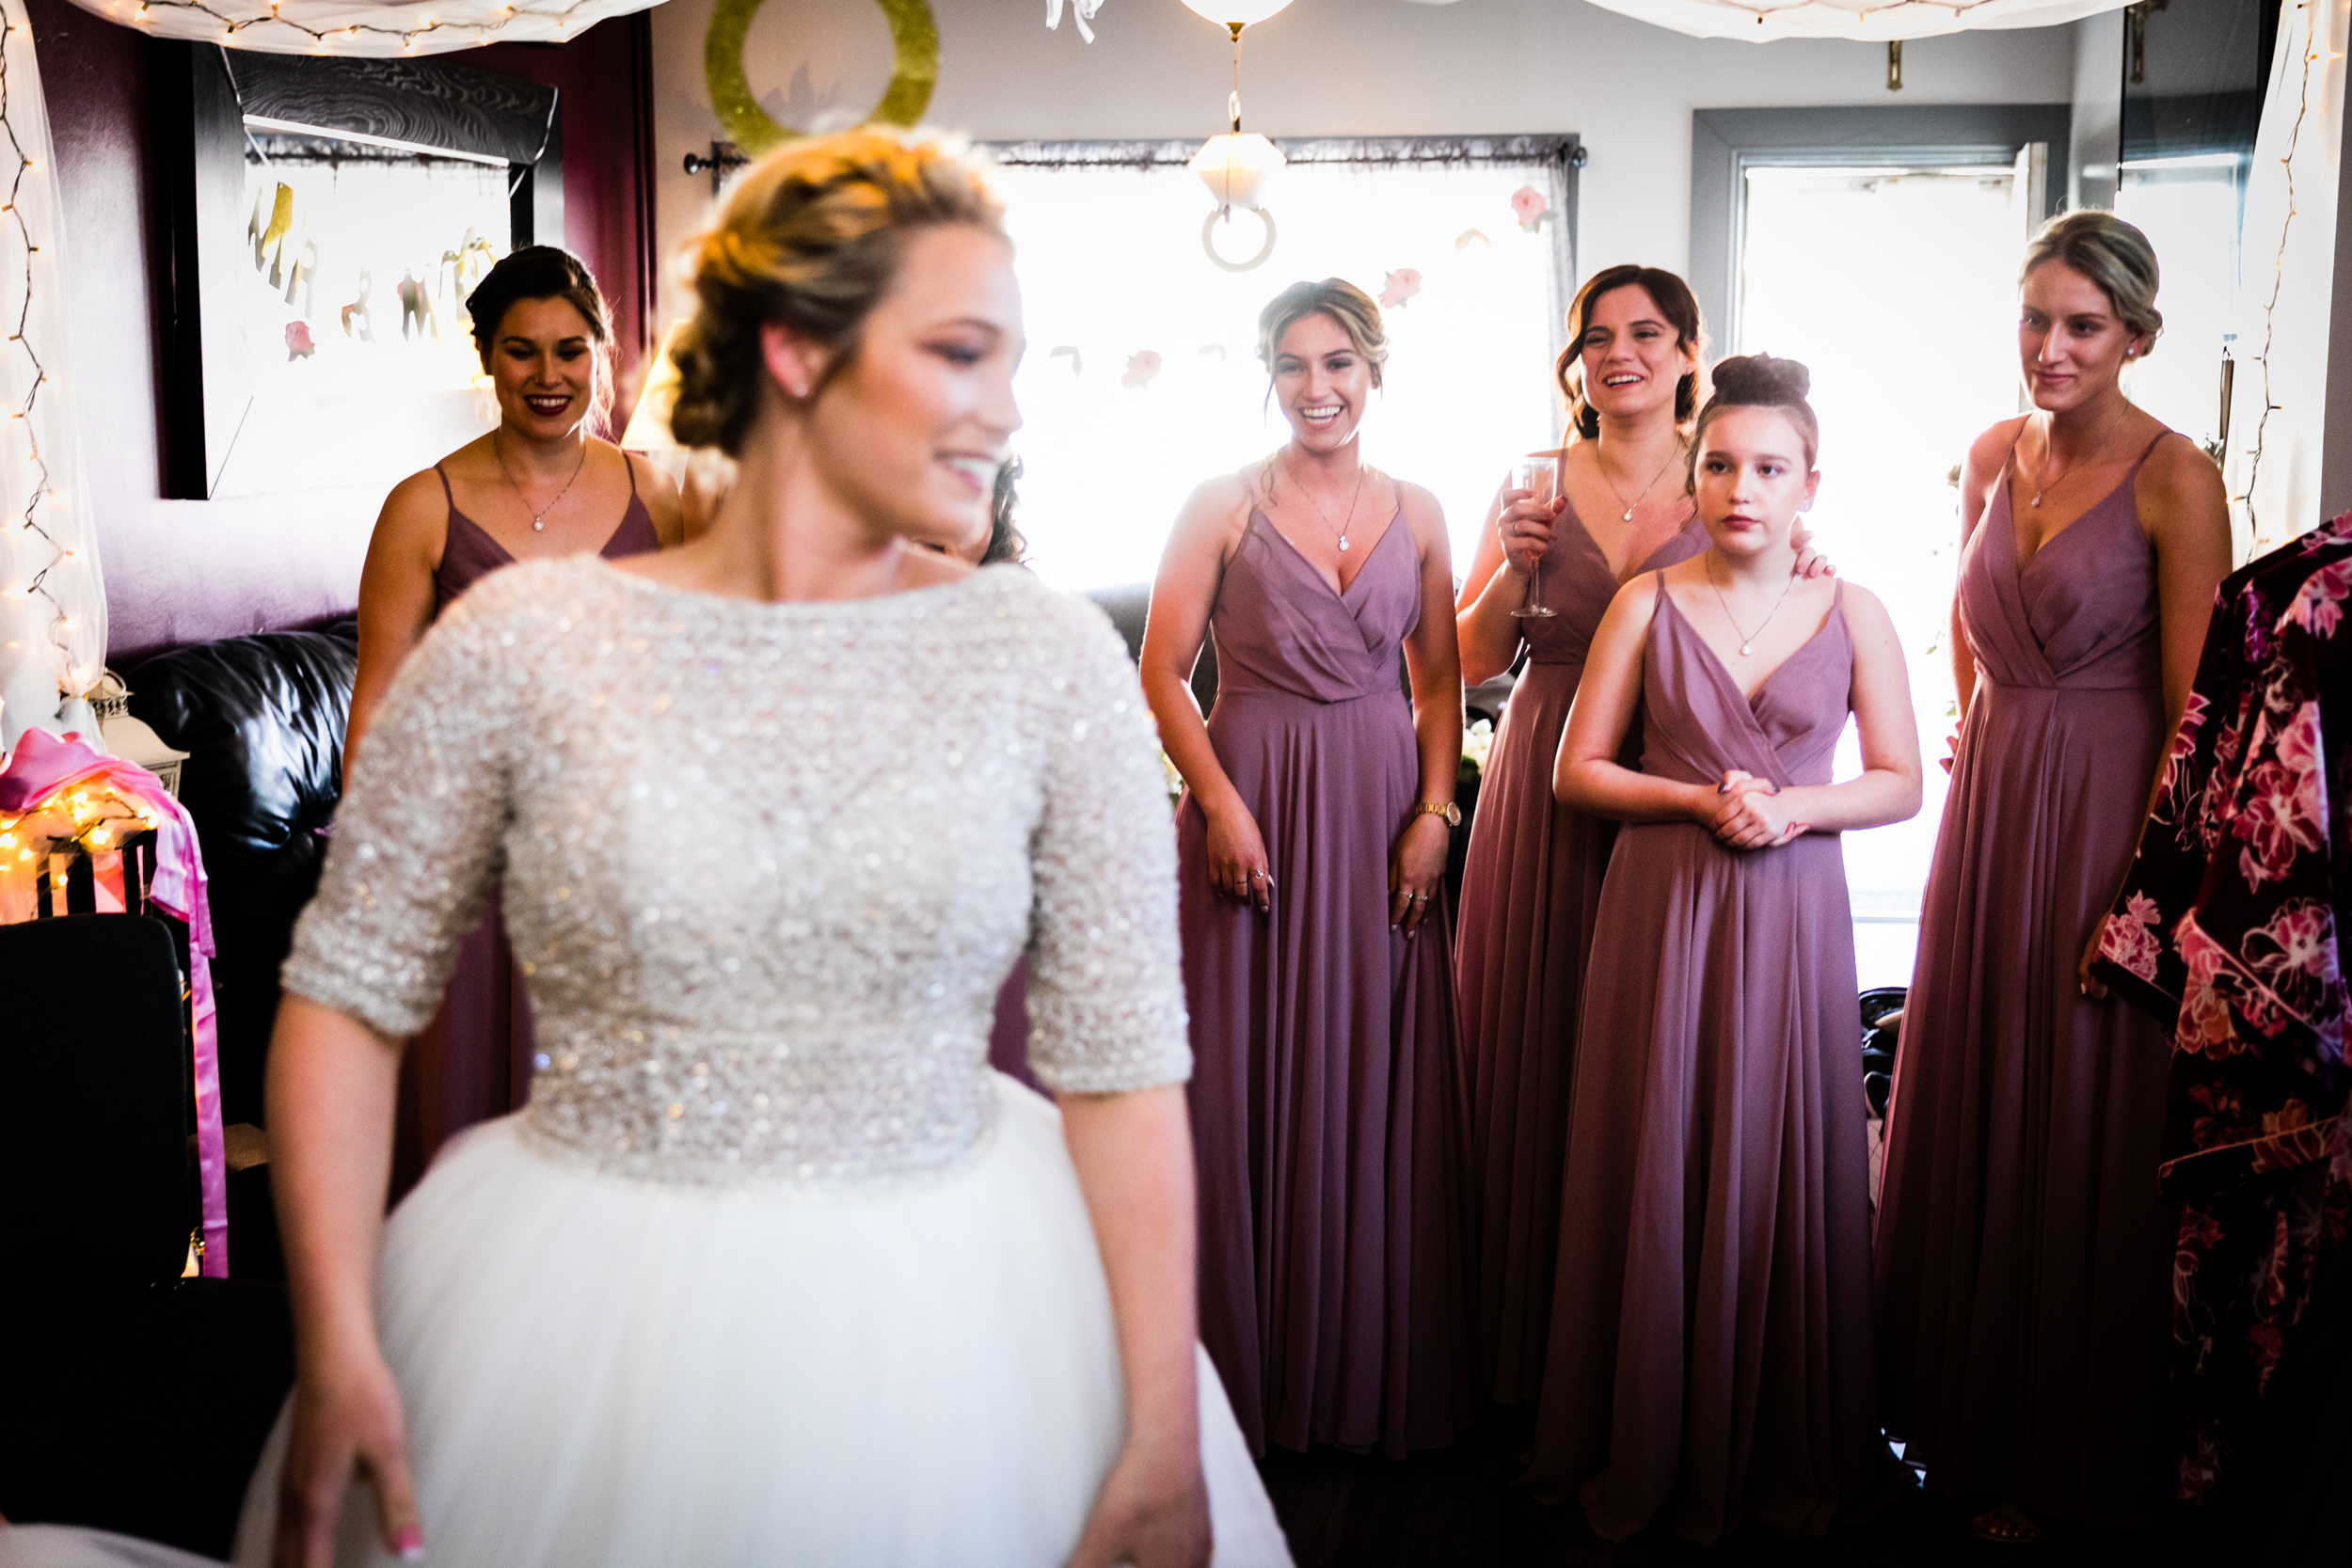 CELEBRATIONS BENSALEM WEDDING PHOTOGRAPHY-32.jpg